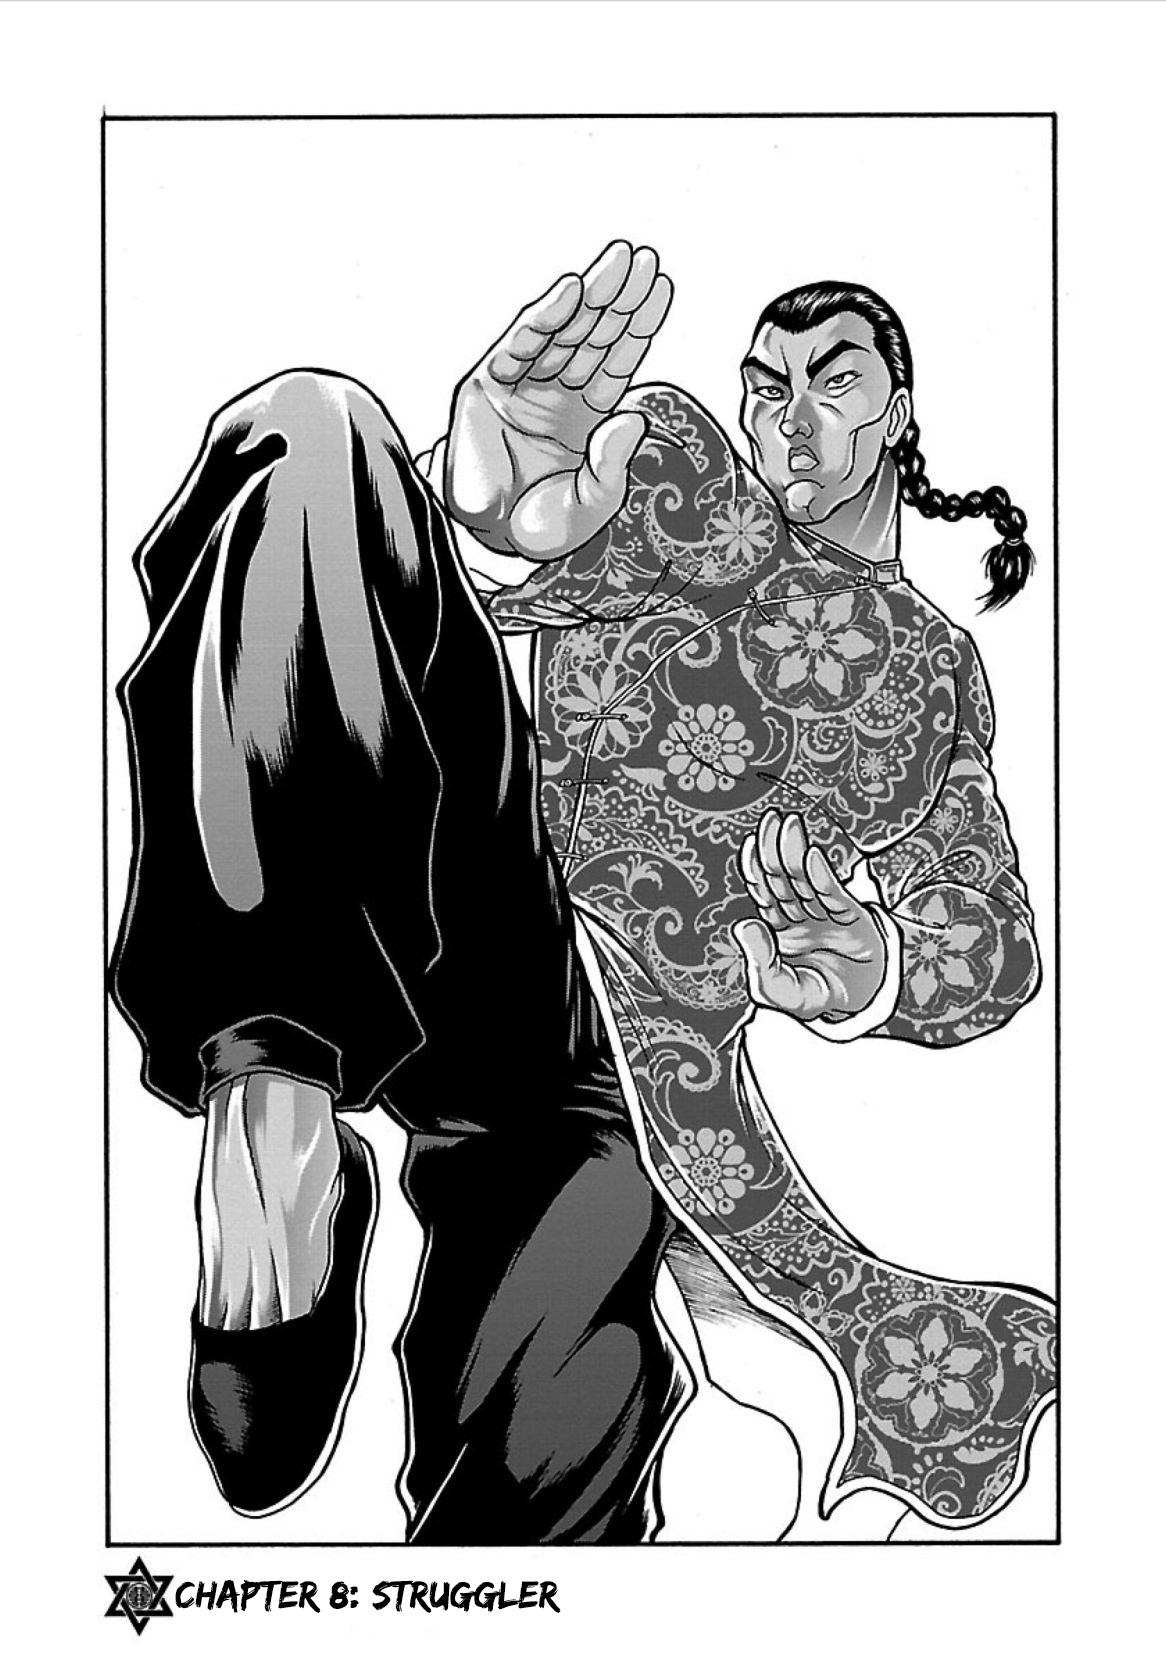 Baki Gaiden - Retsu Kaioh Isekai Tensei Shitemo Ikkō Kamawan! Vol.1 Chapter 8: Struggler page 1 - Mangakakalots.com